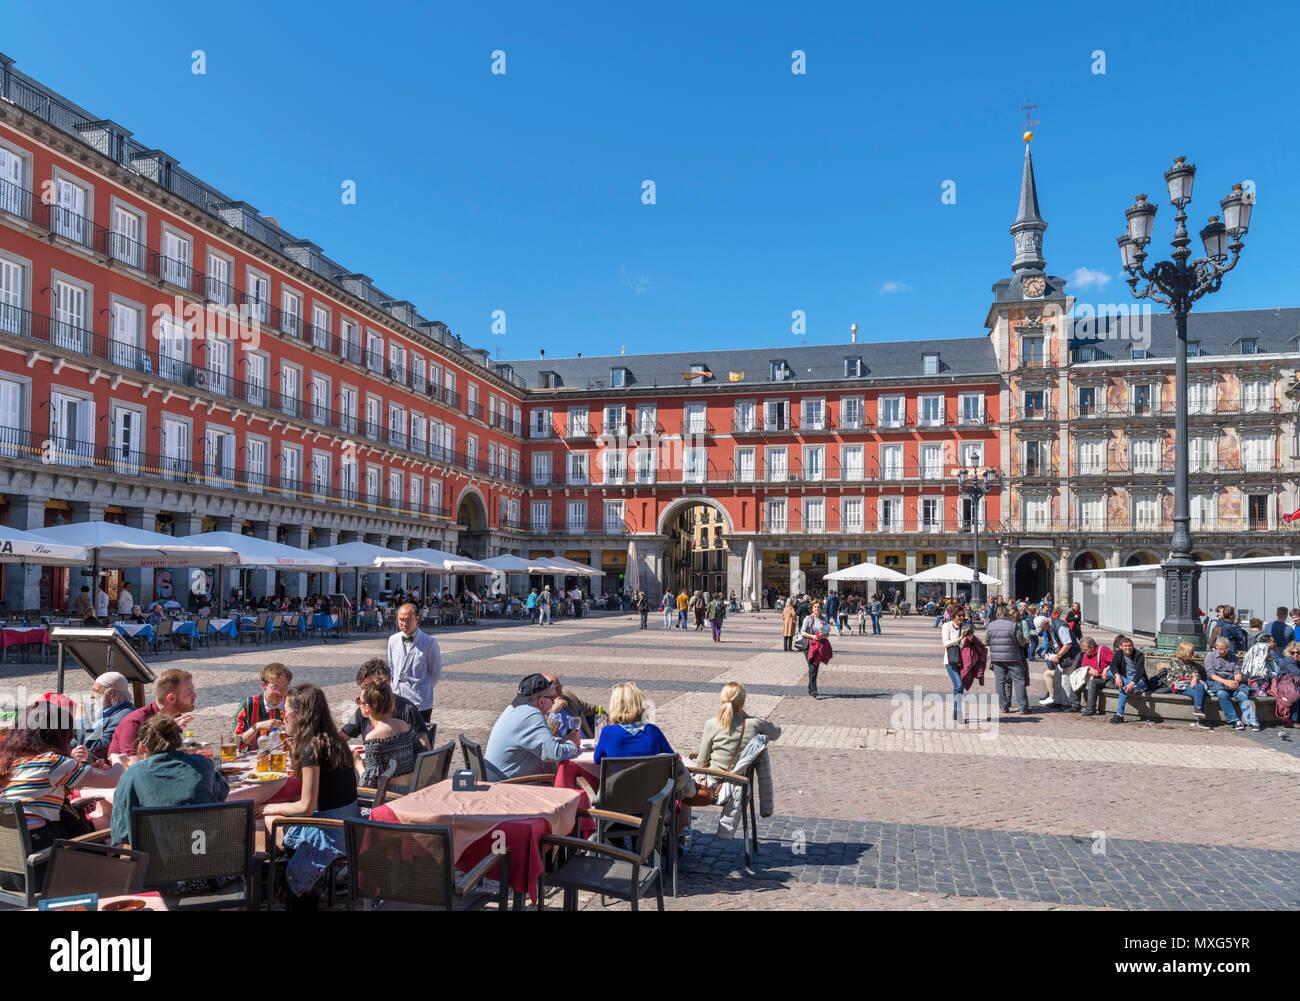 Cafes and restaurants on Plaza Mayor, Madrid, Spain - Stock Image